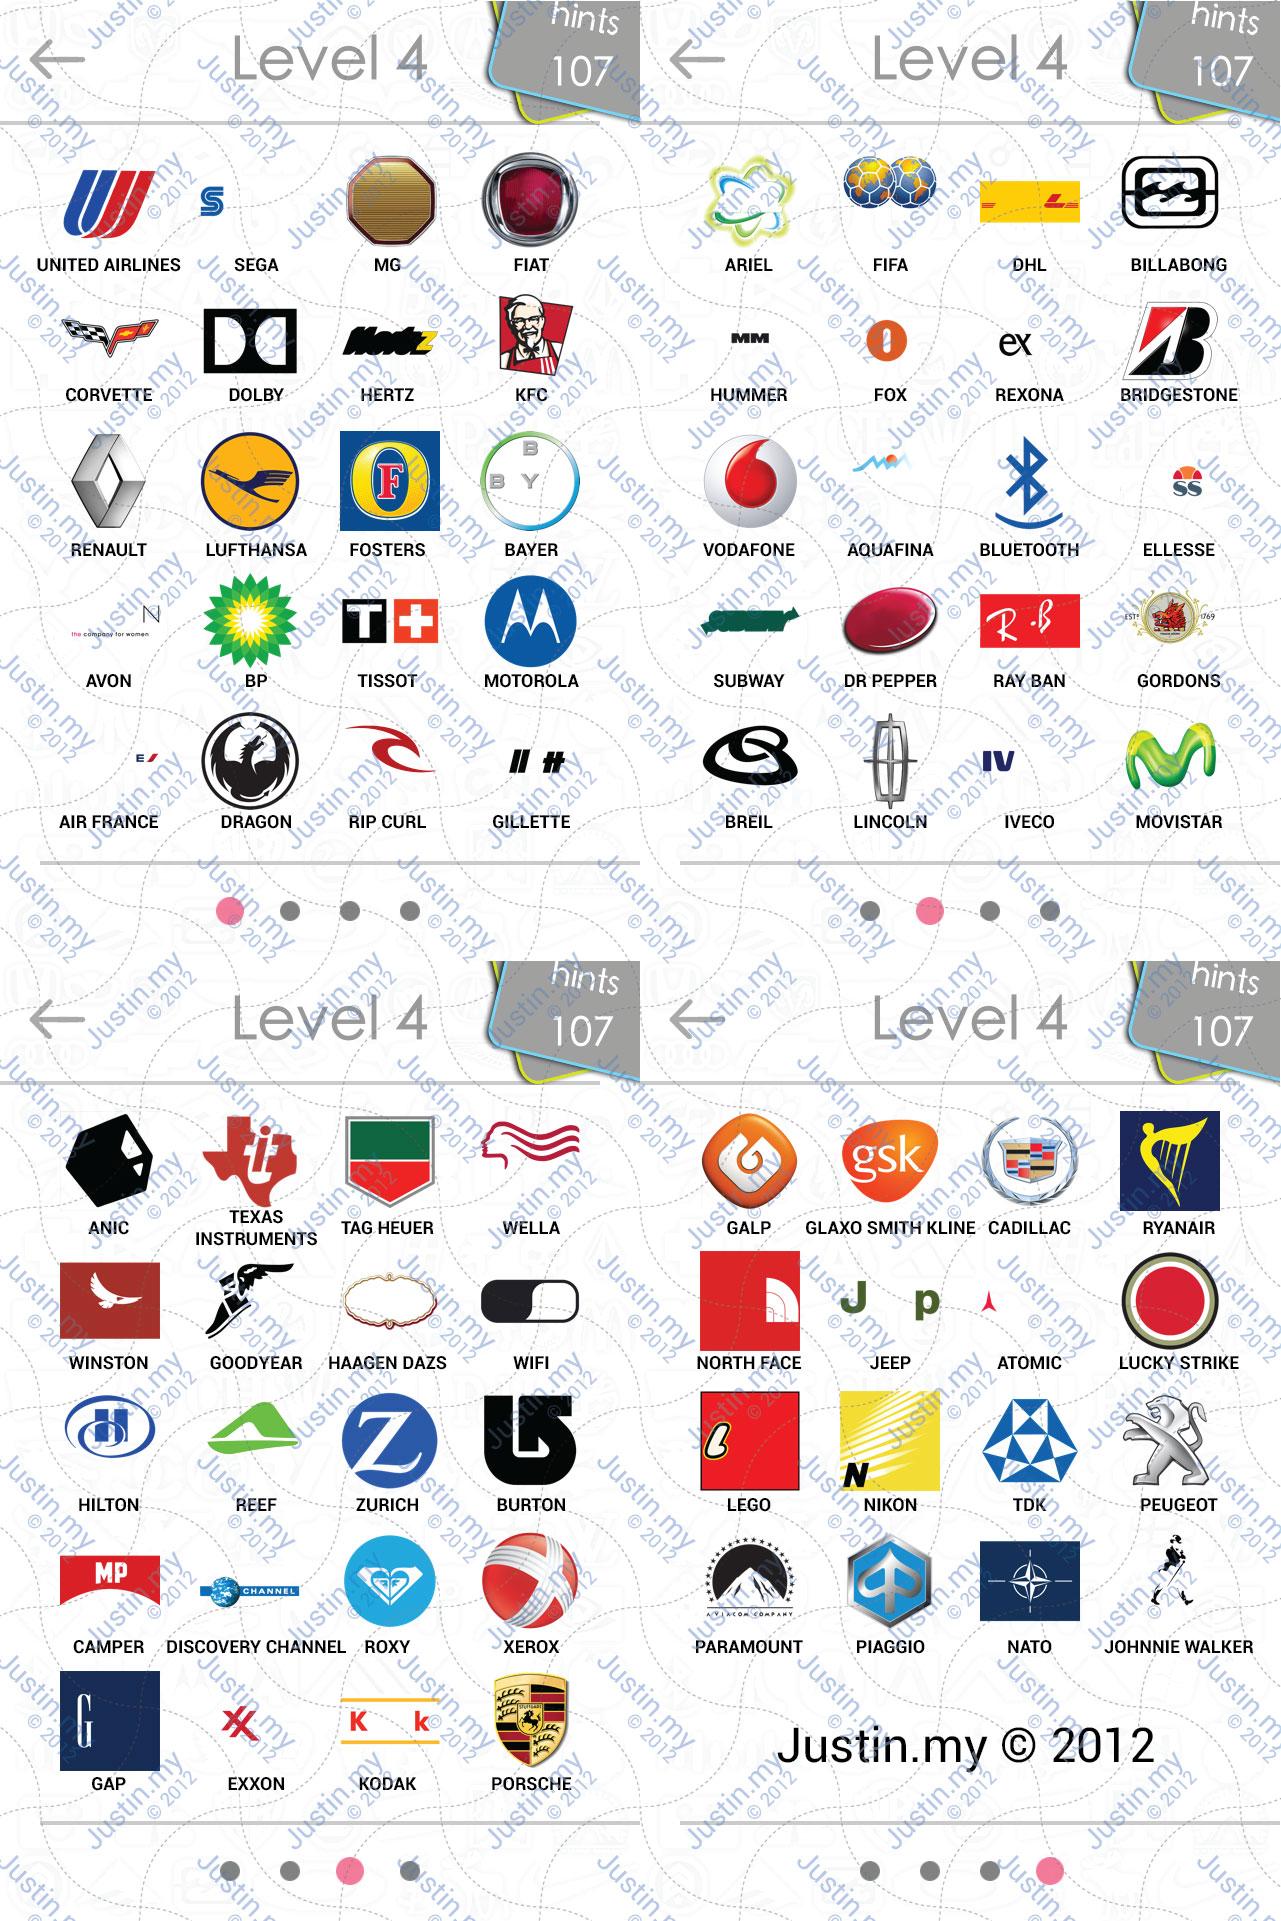 Logos Level 5 : logos, level, Logos, Answers, IPhone,, IPad,, IPod,, Android